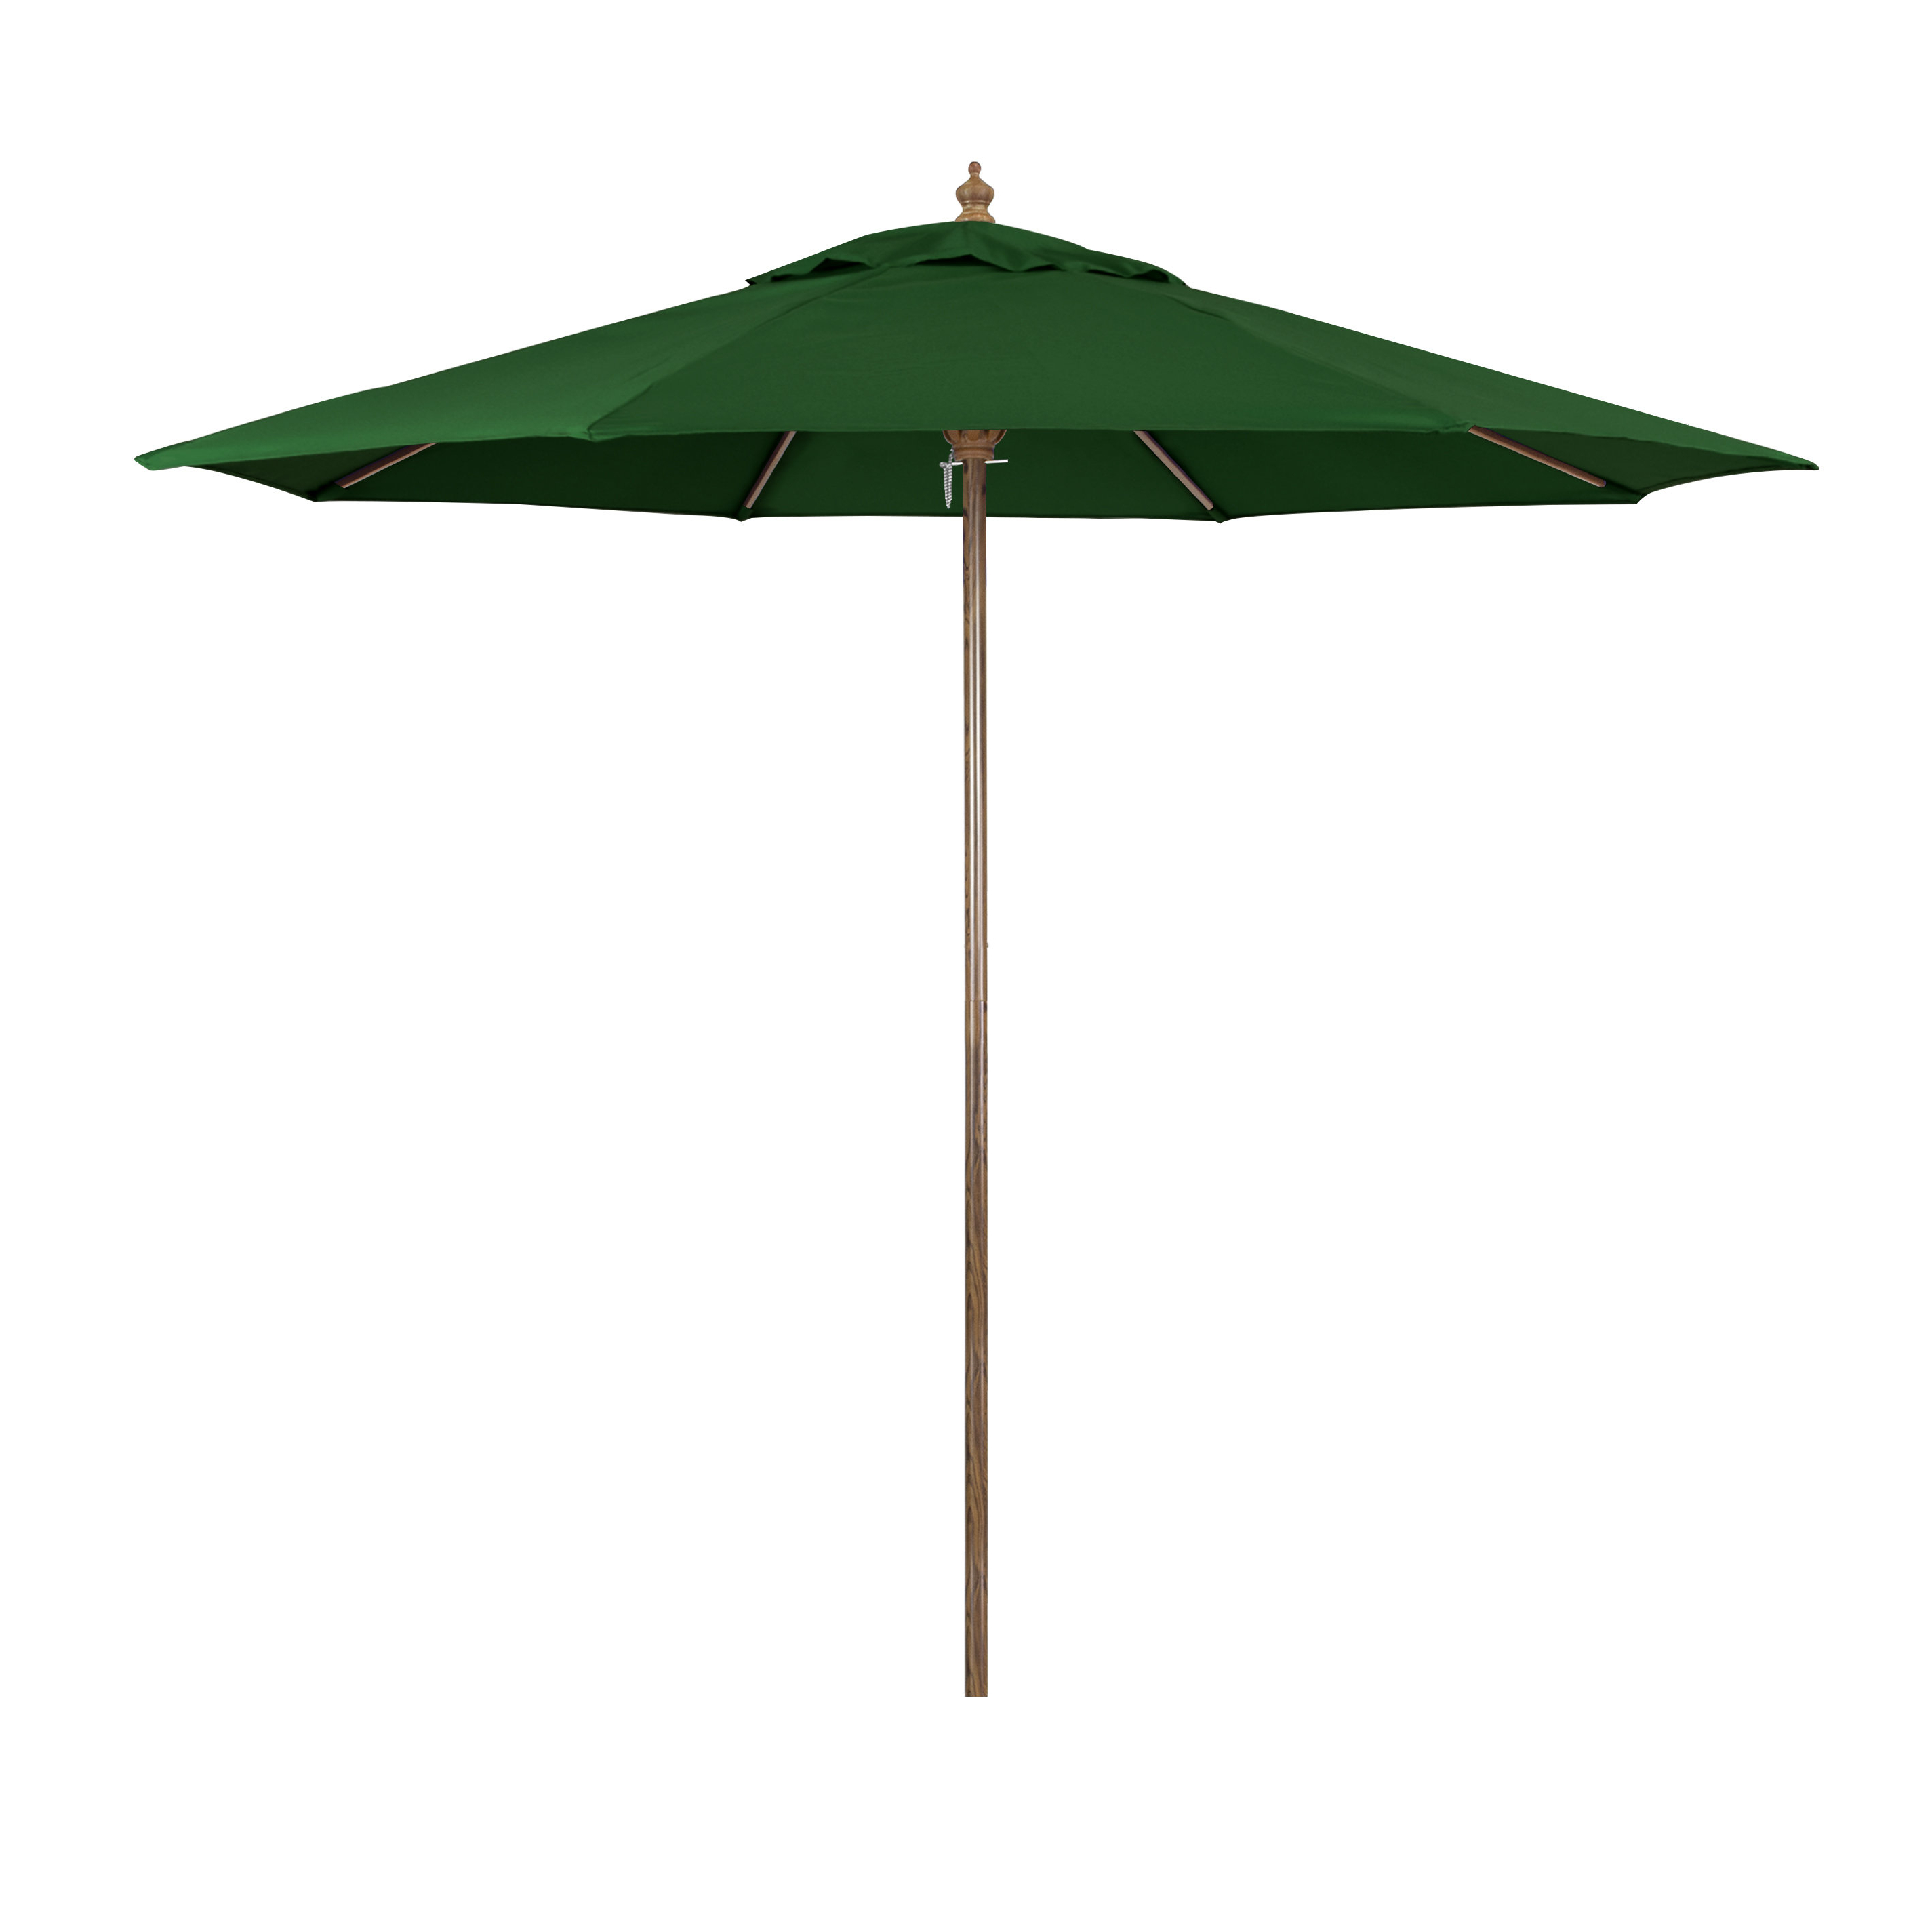 Ryant Cantilever Umbrellas Regarding Preferred Ryant 9' Market Umbrella (Gallery 20 of 20)